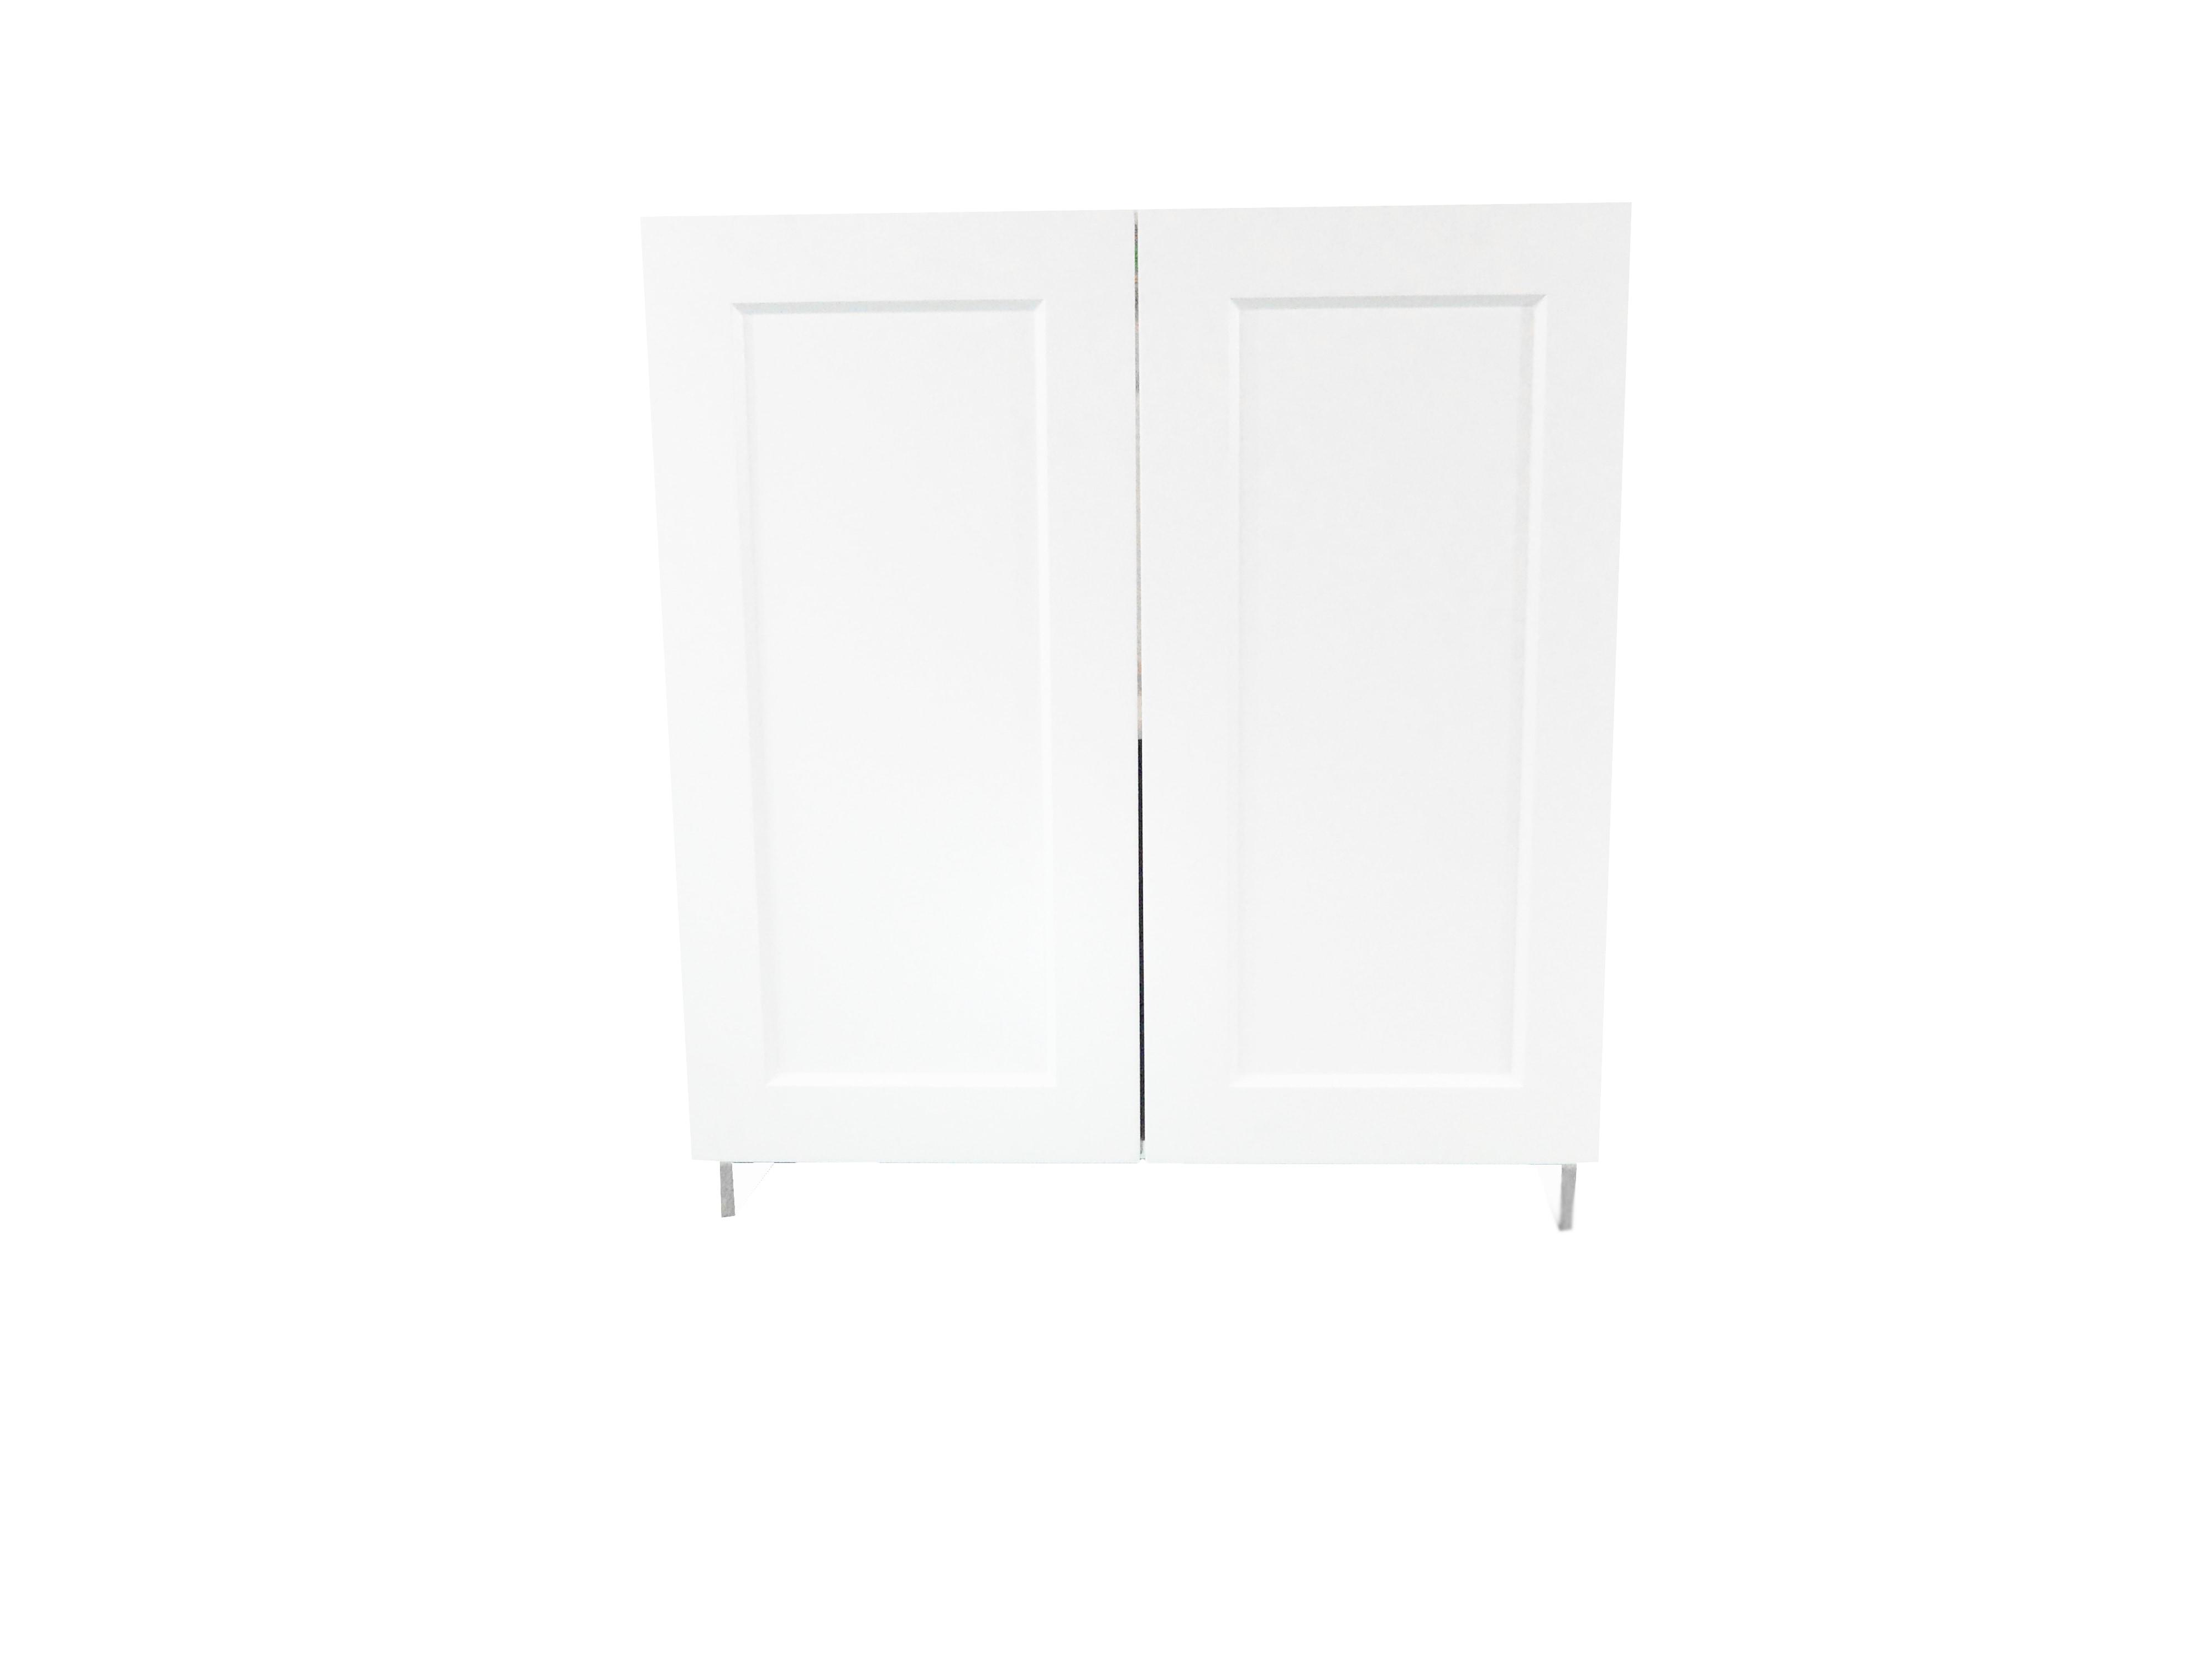 Base Cabinet With 2 Door / Wistler White / Flat Panel White / 24 Whistler White 0